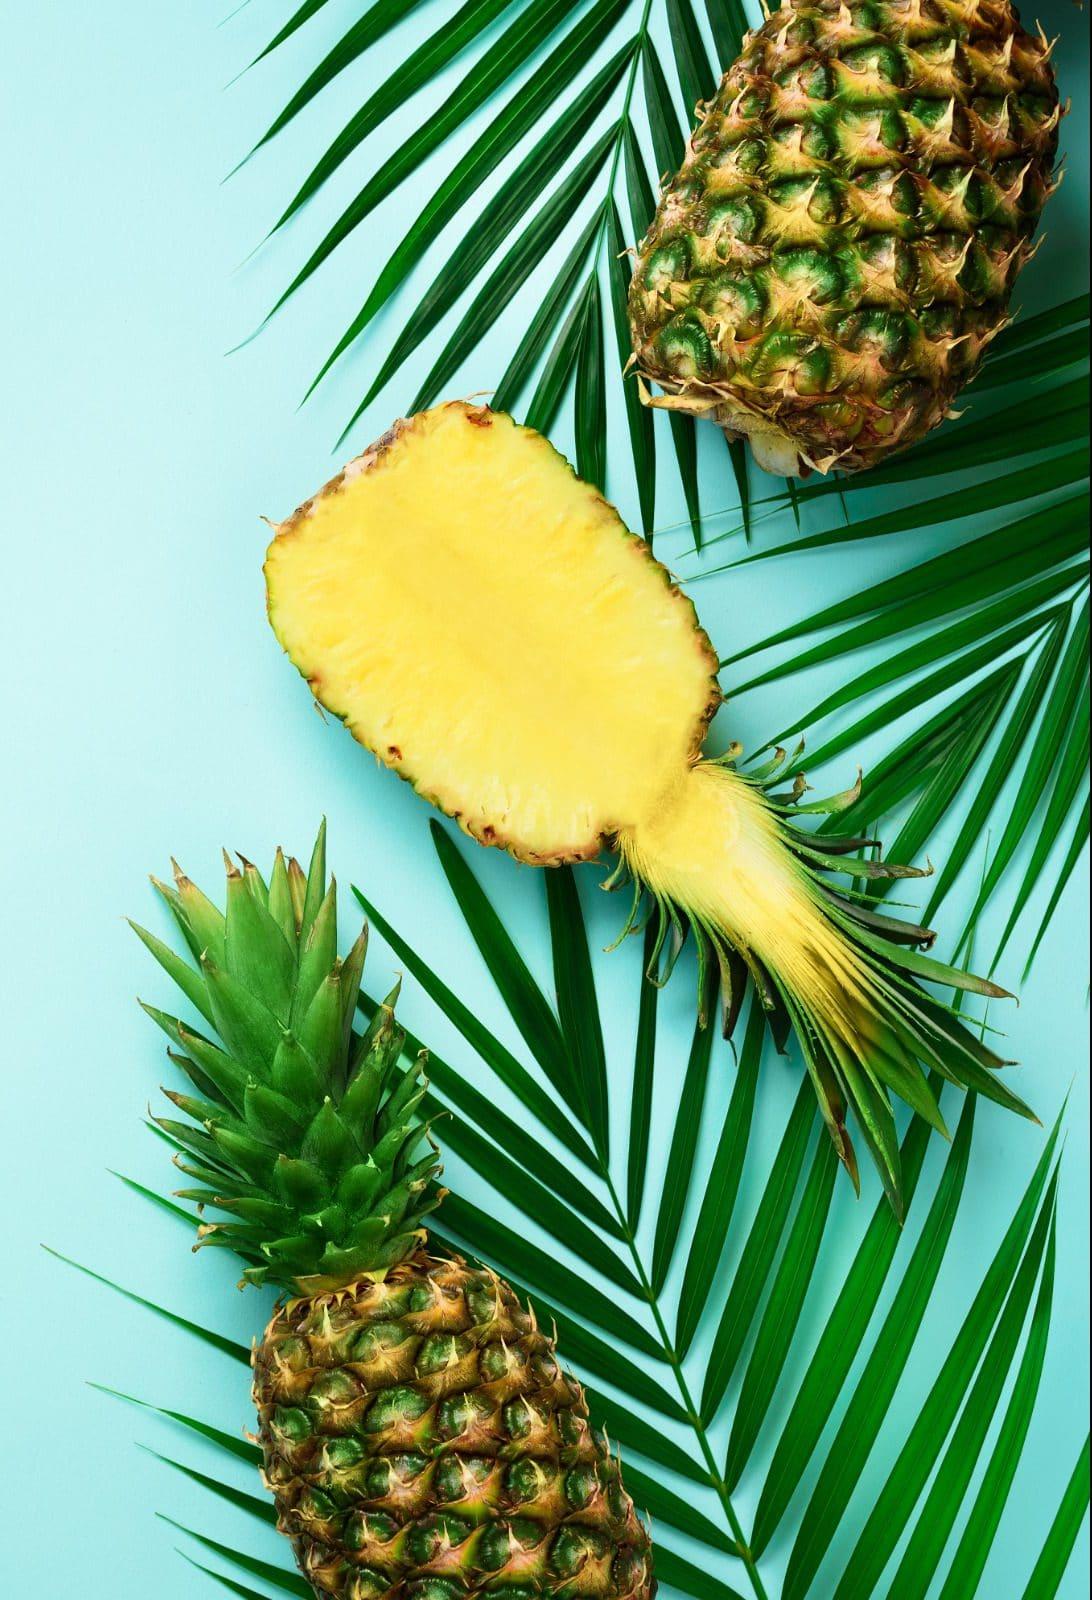 Ananas feuille palmier vacances.